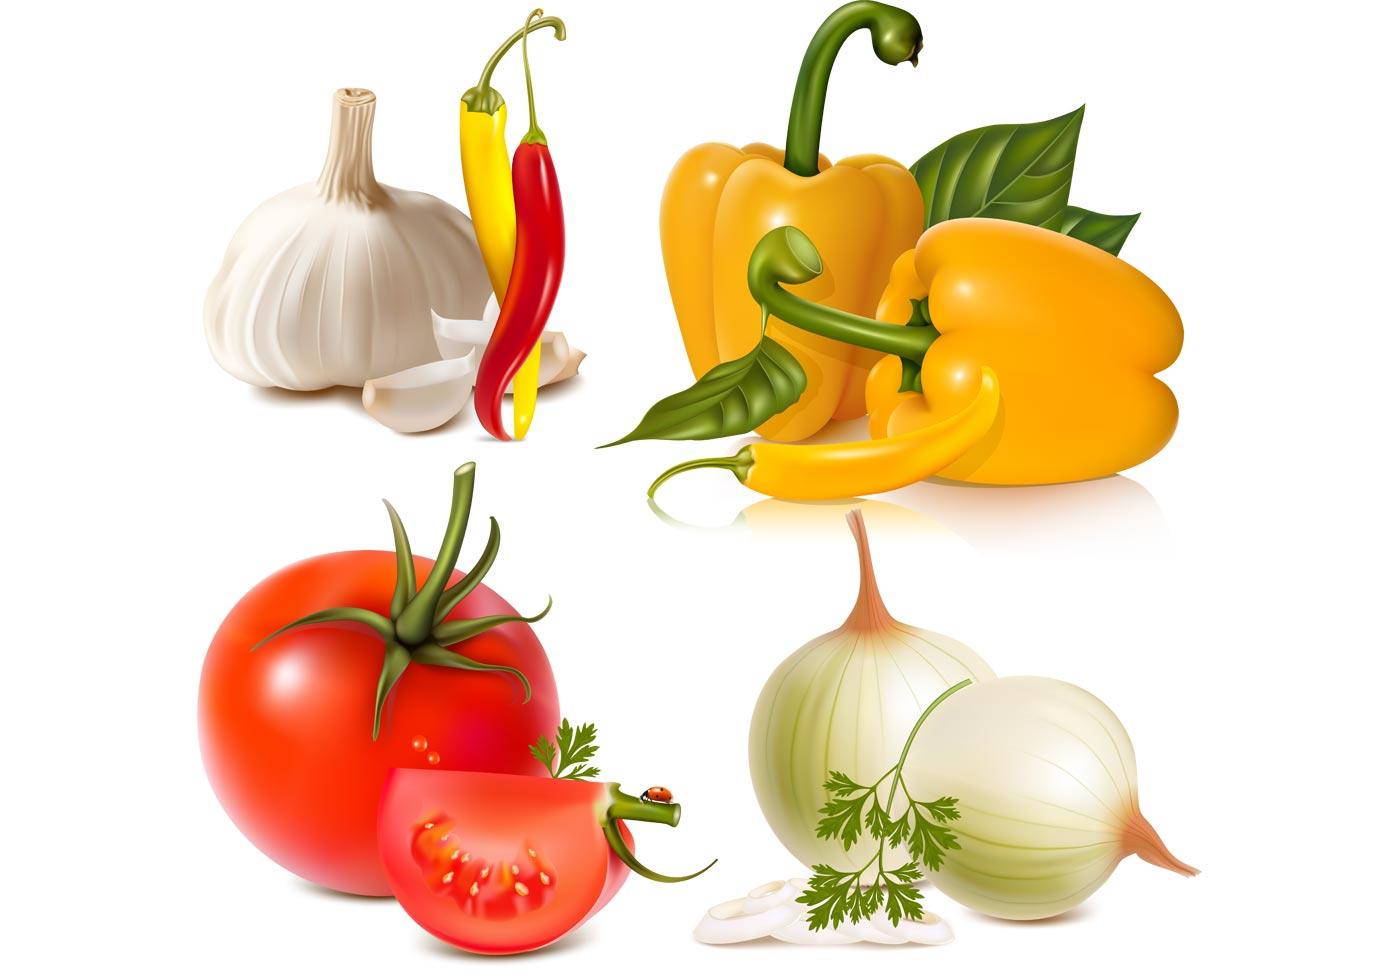 Vegetables Free Vector Graphic - Download Free Vector Art